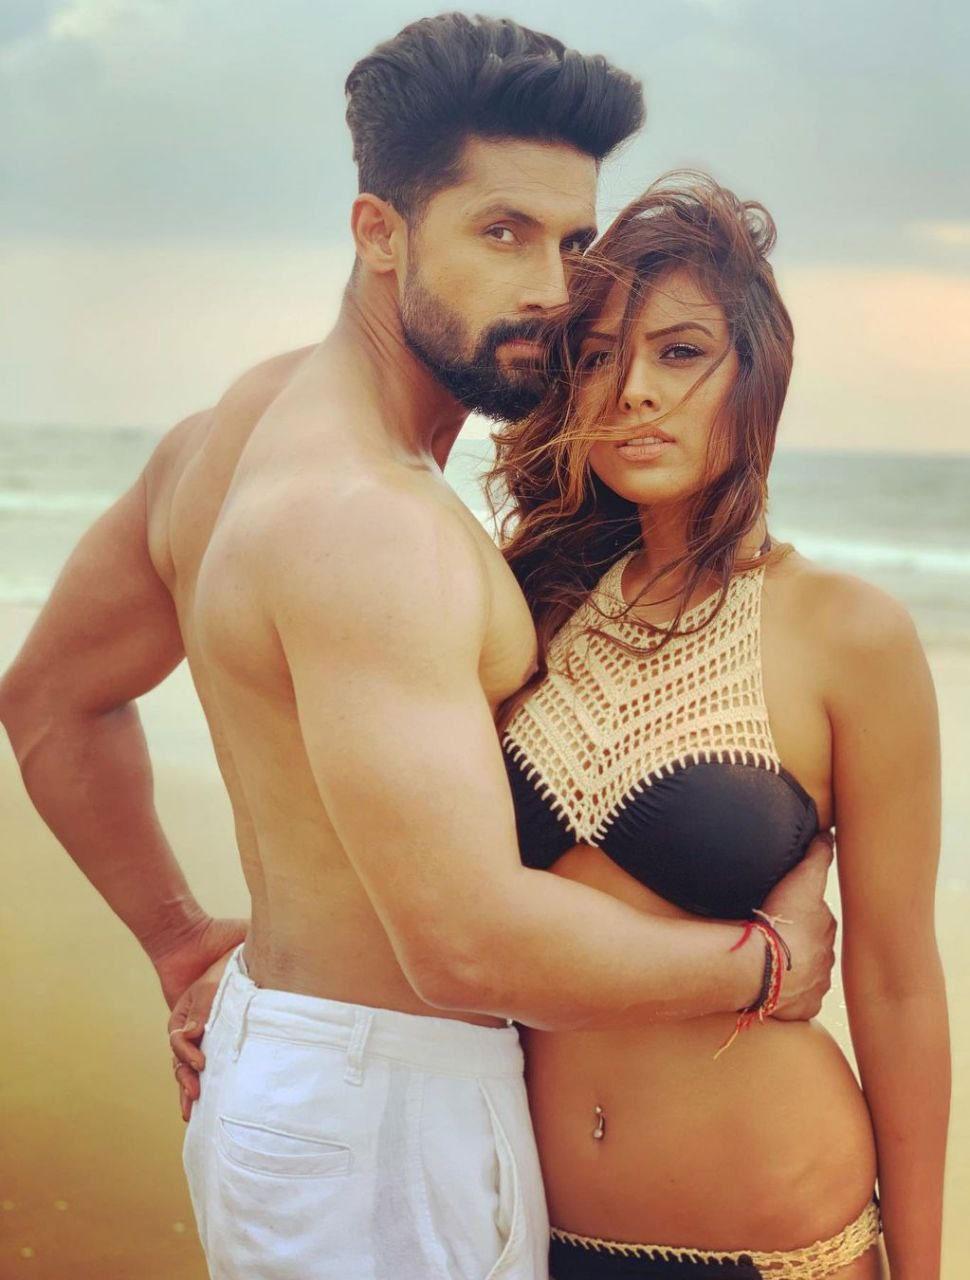 Nia Sharma And Ravi Dubey On Beach Bold And Hot Photos Goes Viral On  Internet | Nia Sharma और Ravi Dubey ने समुद्र किनारे दिए ऐसे पोज, लोग बोले-  'So Hot' |